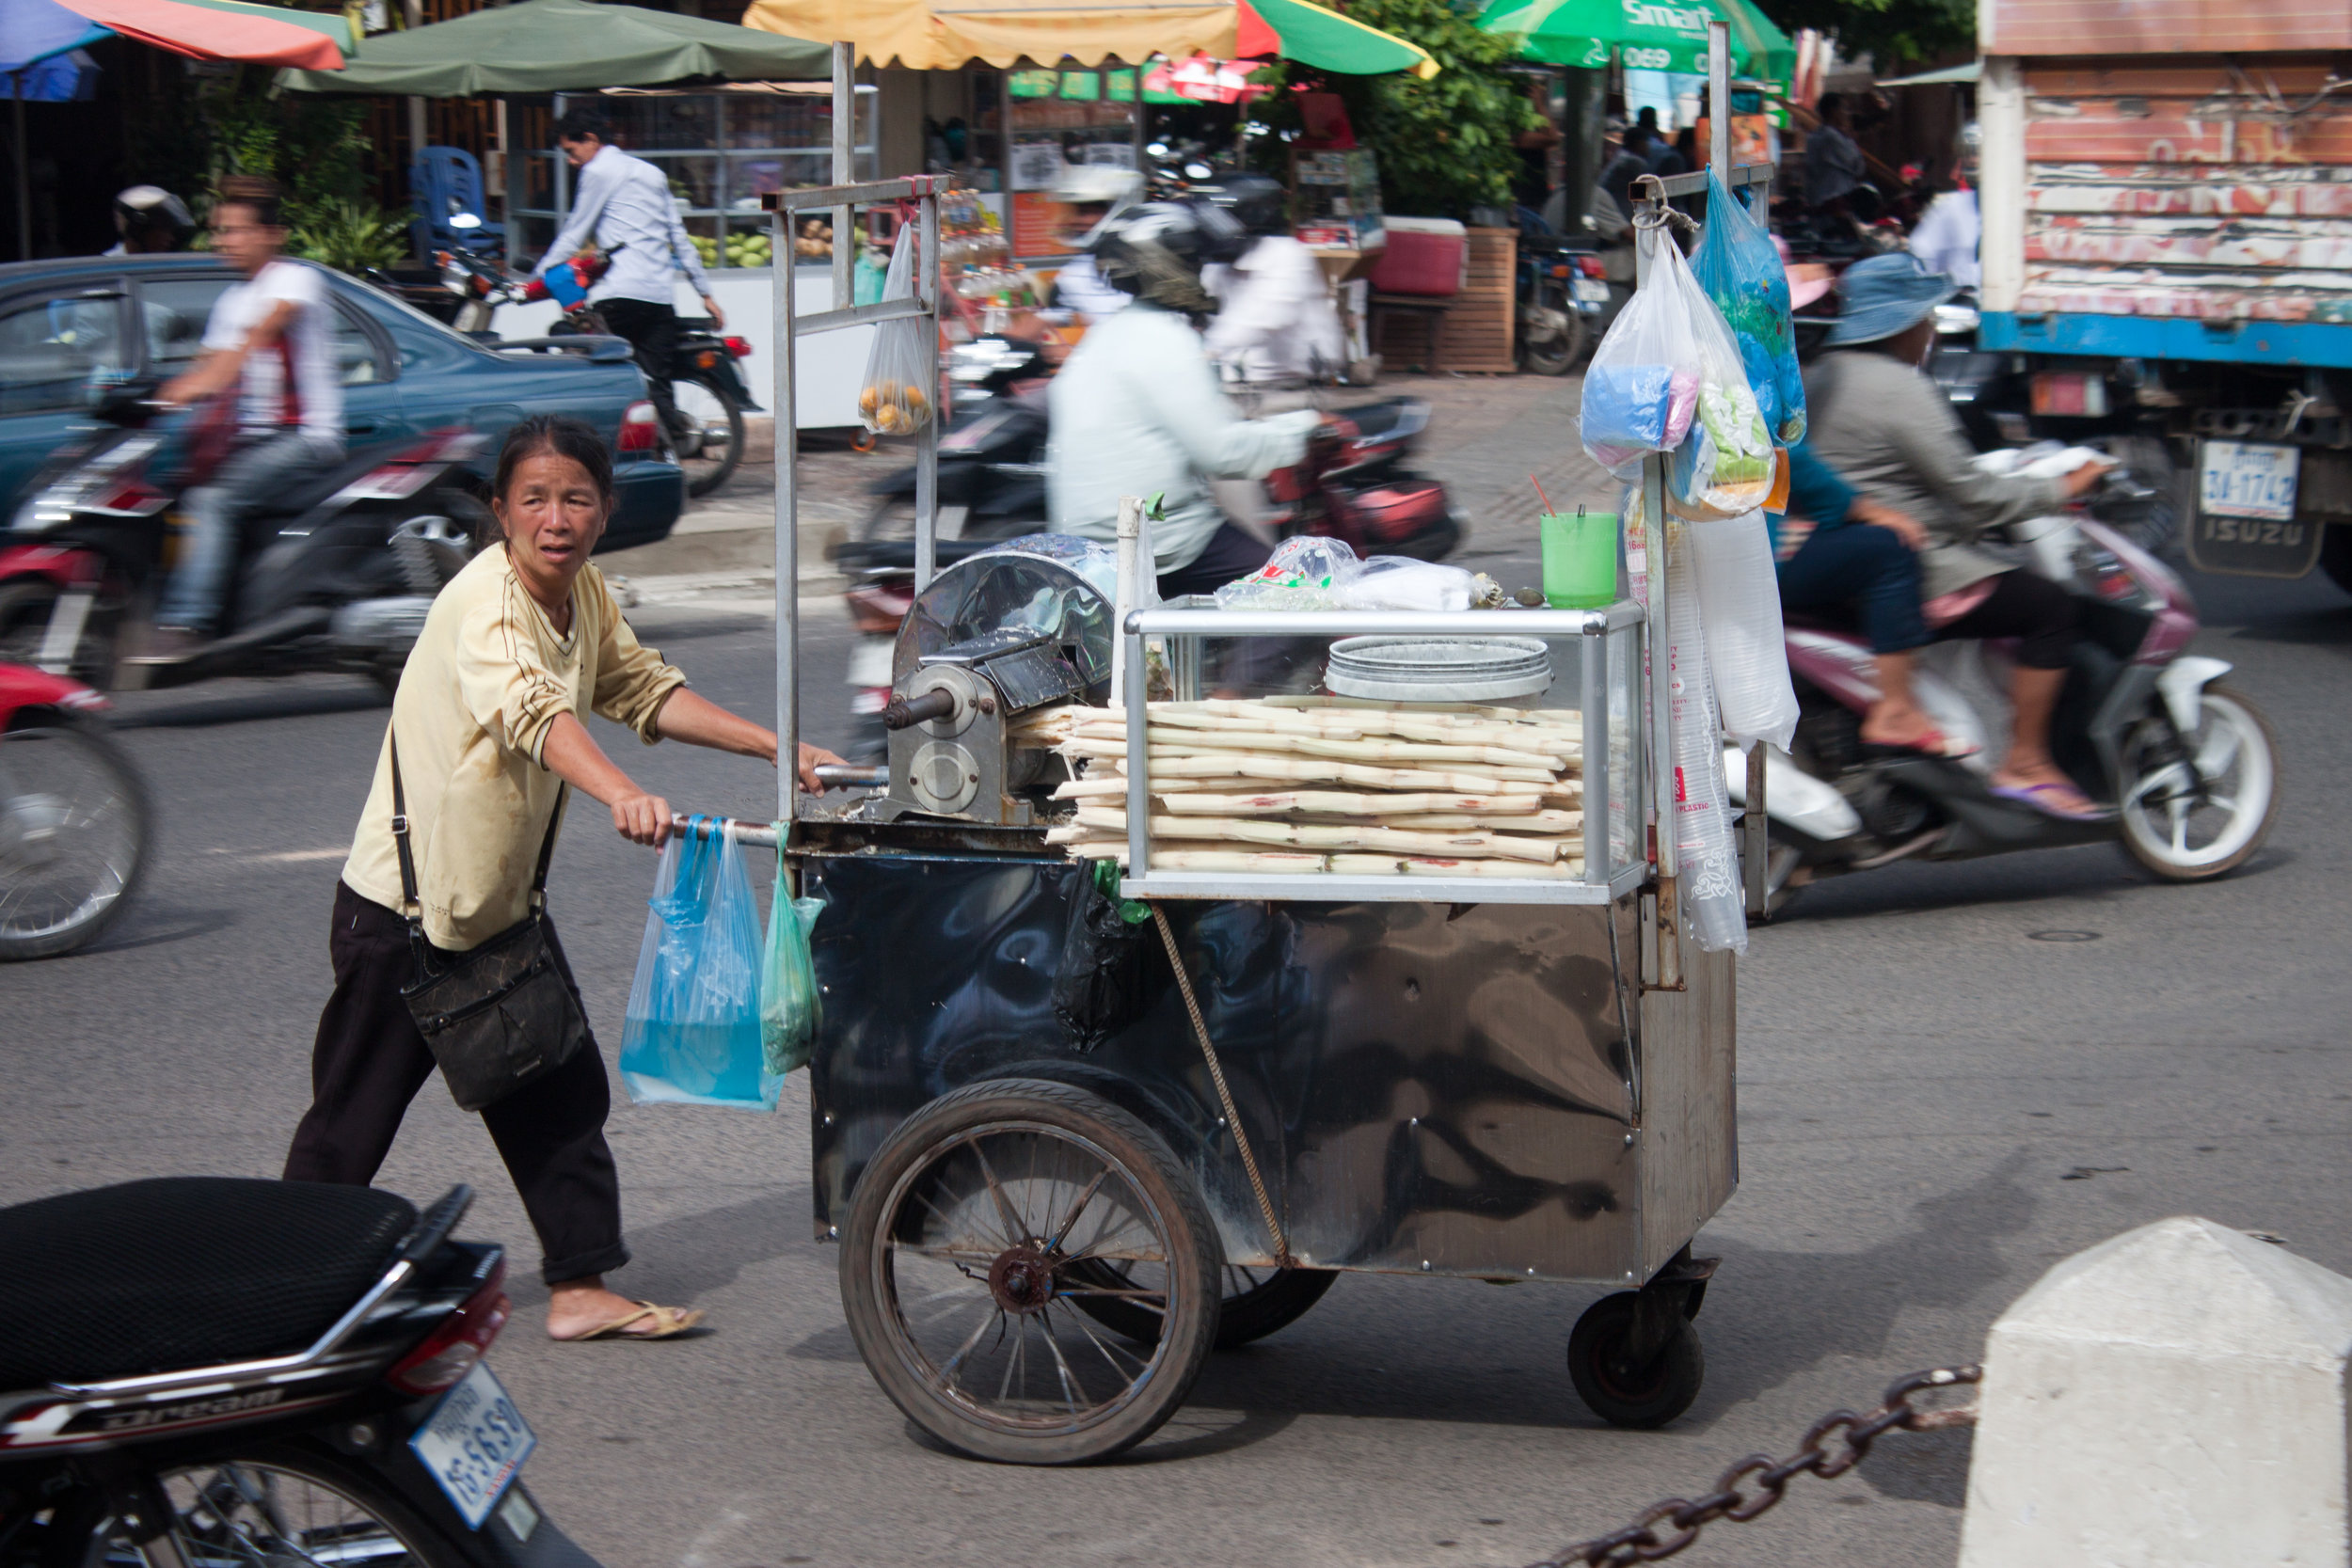 Cambodia - Phnom Penh city and people - Junen 2012 034.jpg